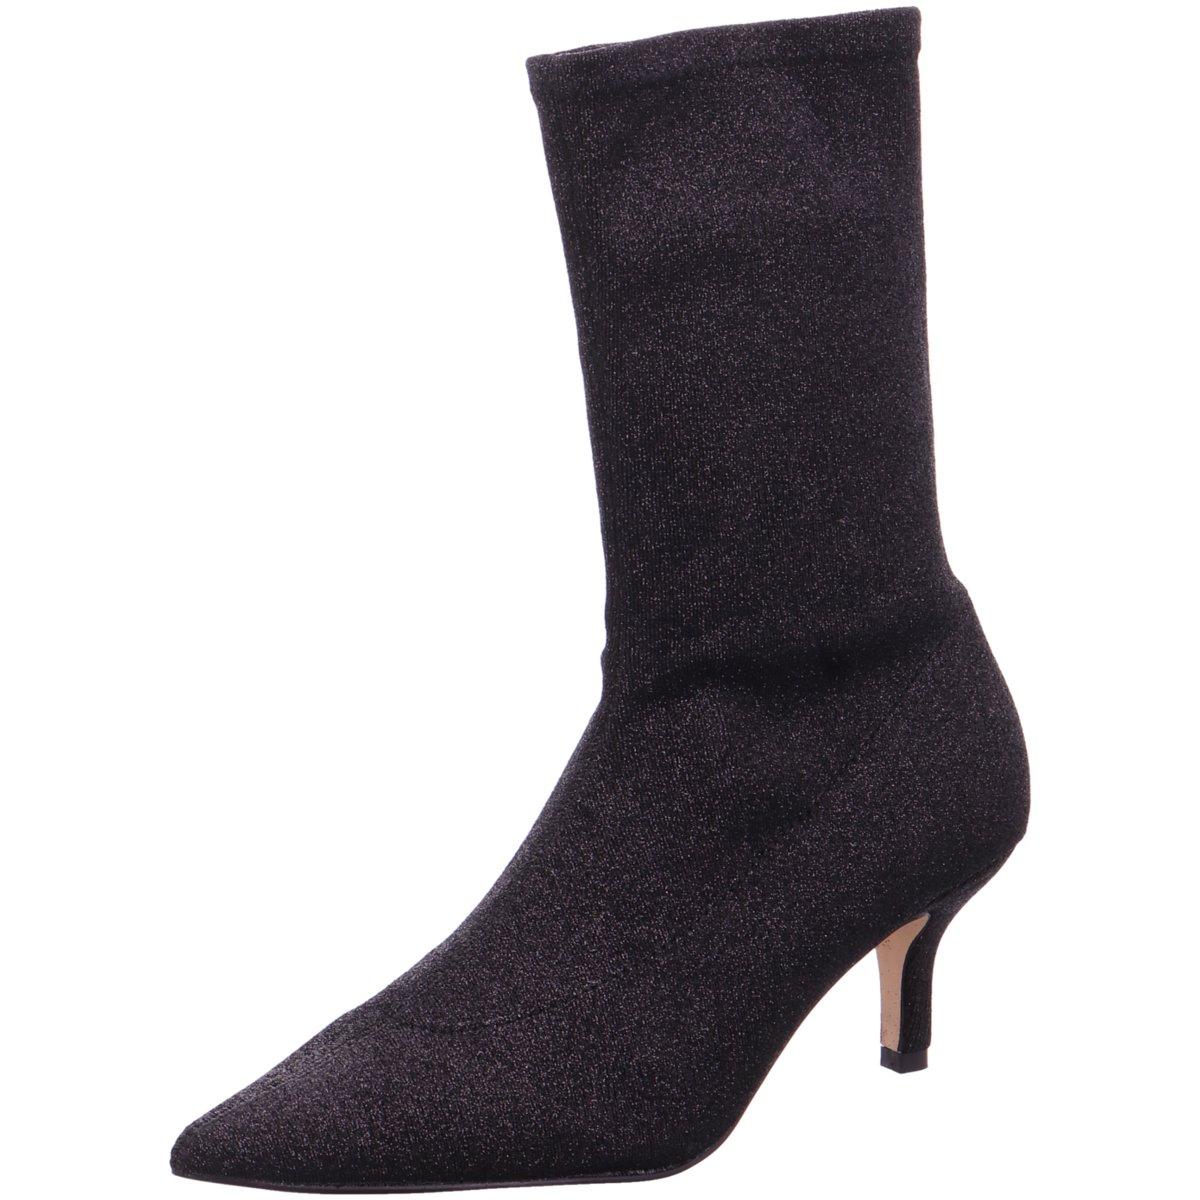 La Strada Damen Stiefeletten Stiefelette 1703048 schwarz 548468